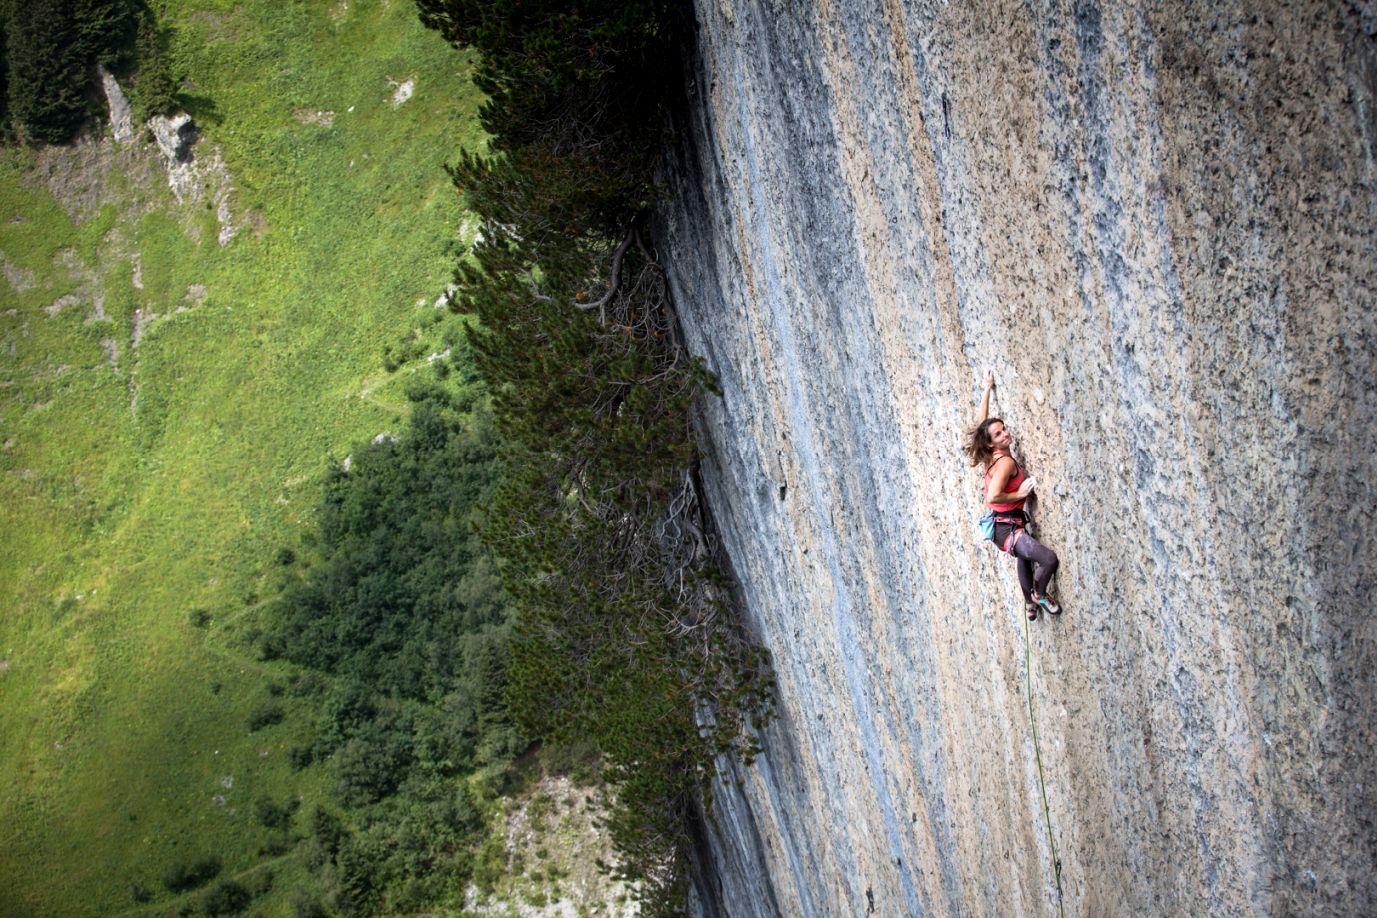 Barbara Zangerl beim Klettern, Foto: Tobias Attenberger | Climbers Paradise